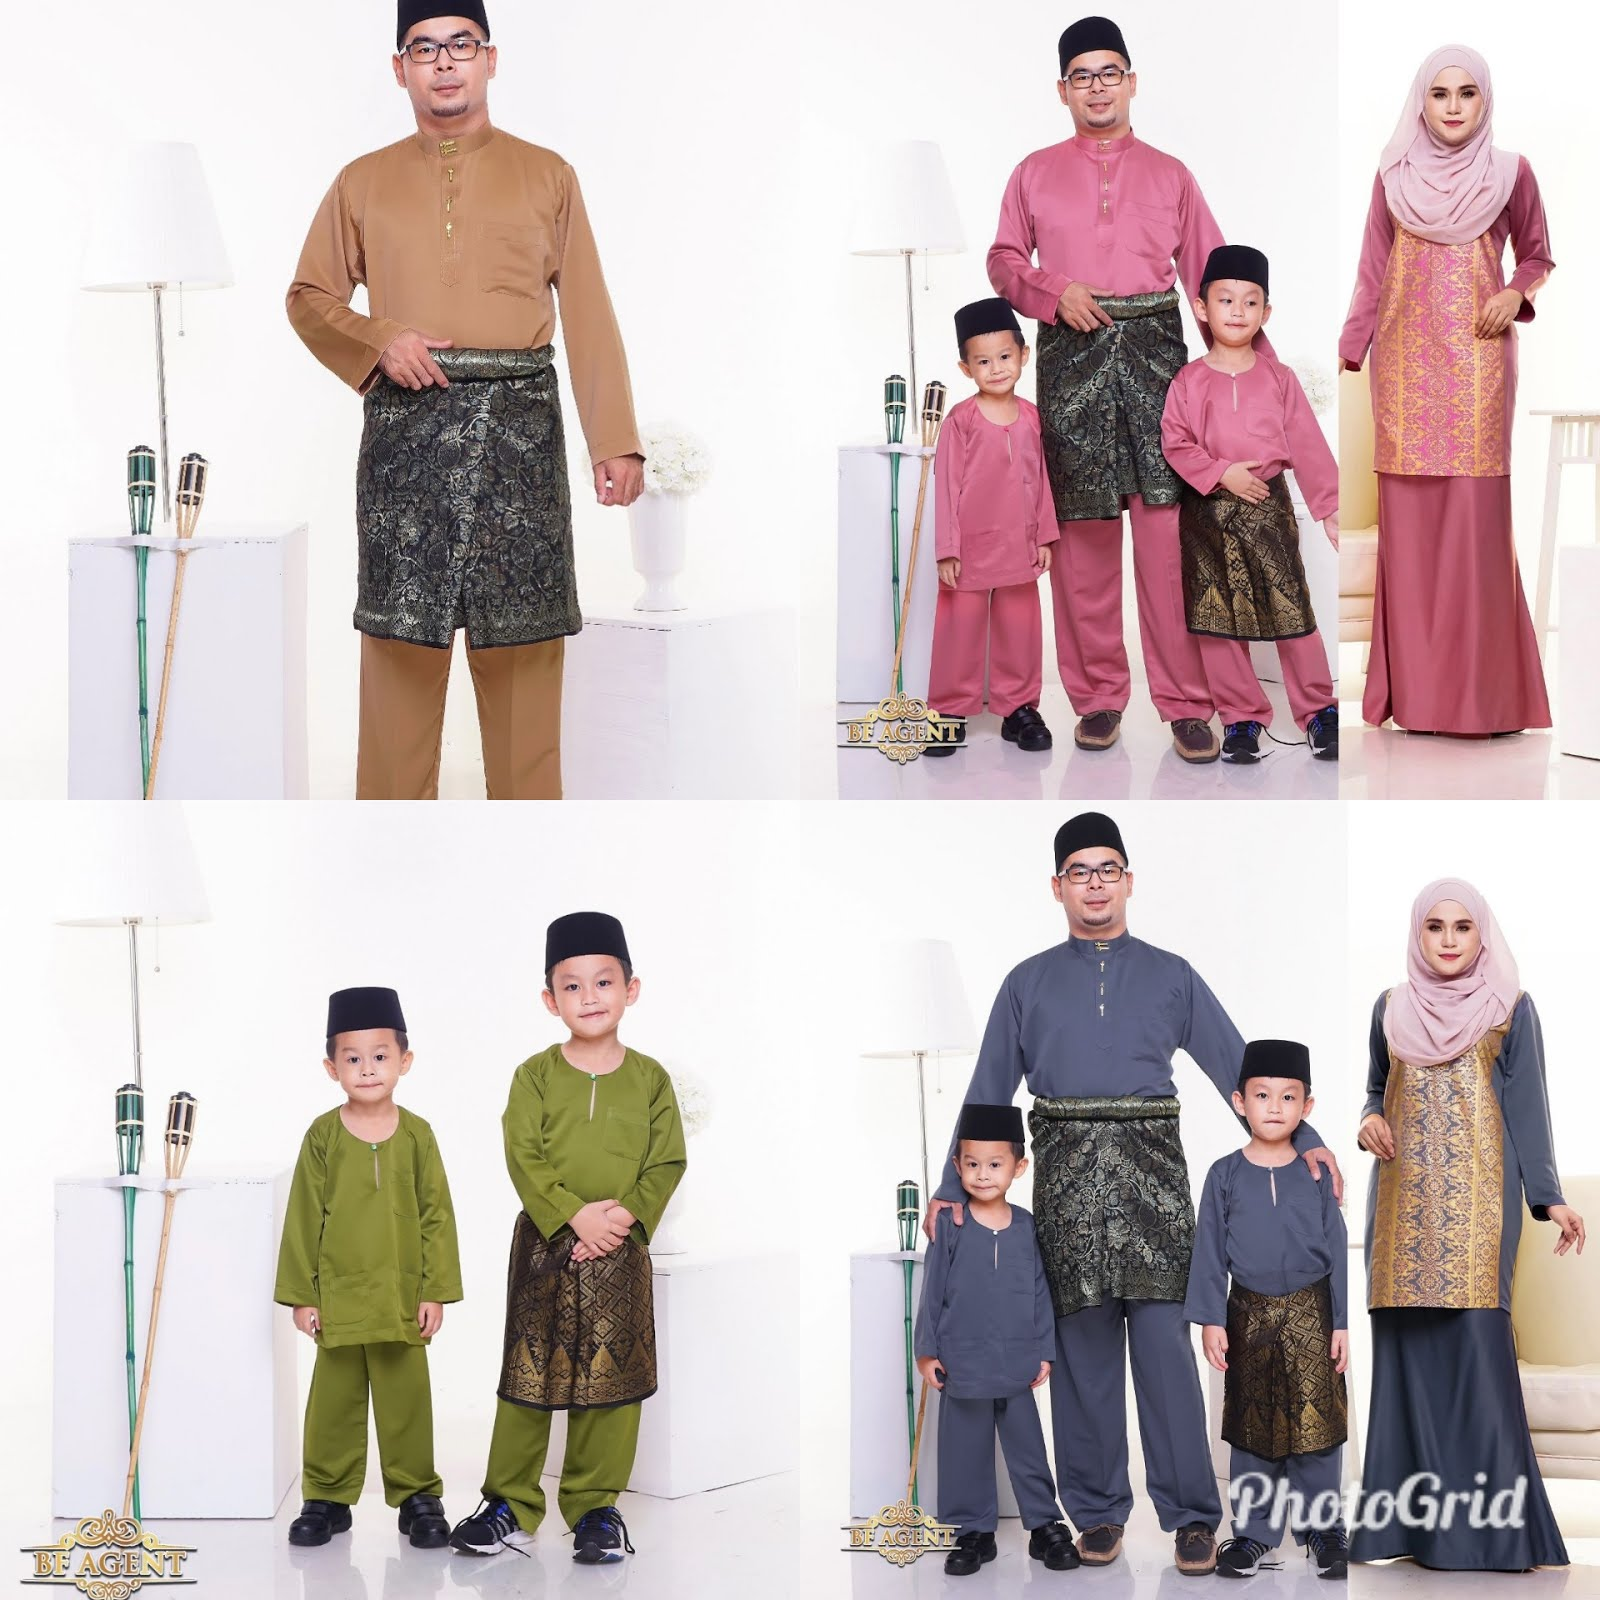 Jom dapatkan baju melayu berkualiti untuk dewasa. Baju melayu kanak kanak pun ada. Confirm suka!!